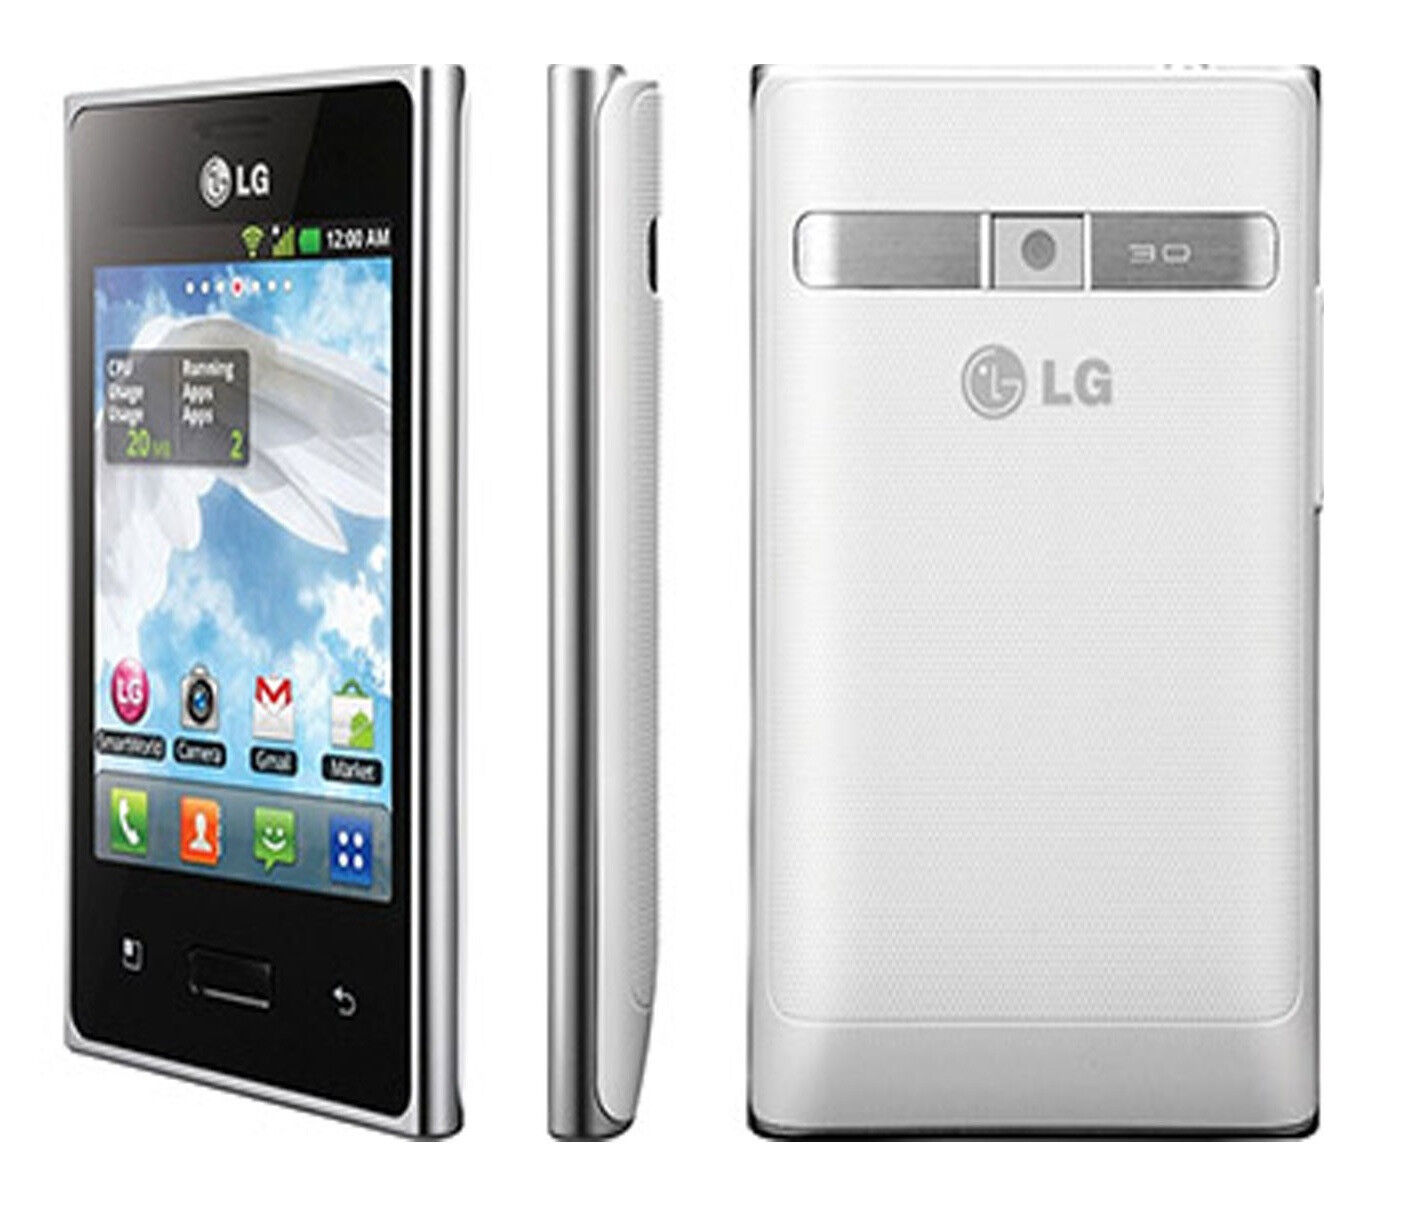 New LG Optimus L3 E400 Unlocked GSM Phone Android 2 3 OS 3 2MP Camera GPS Wi Fi